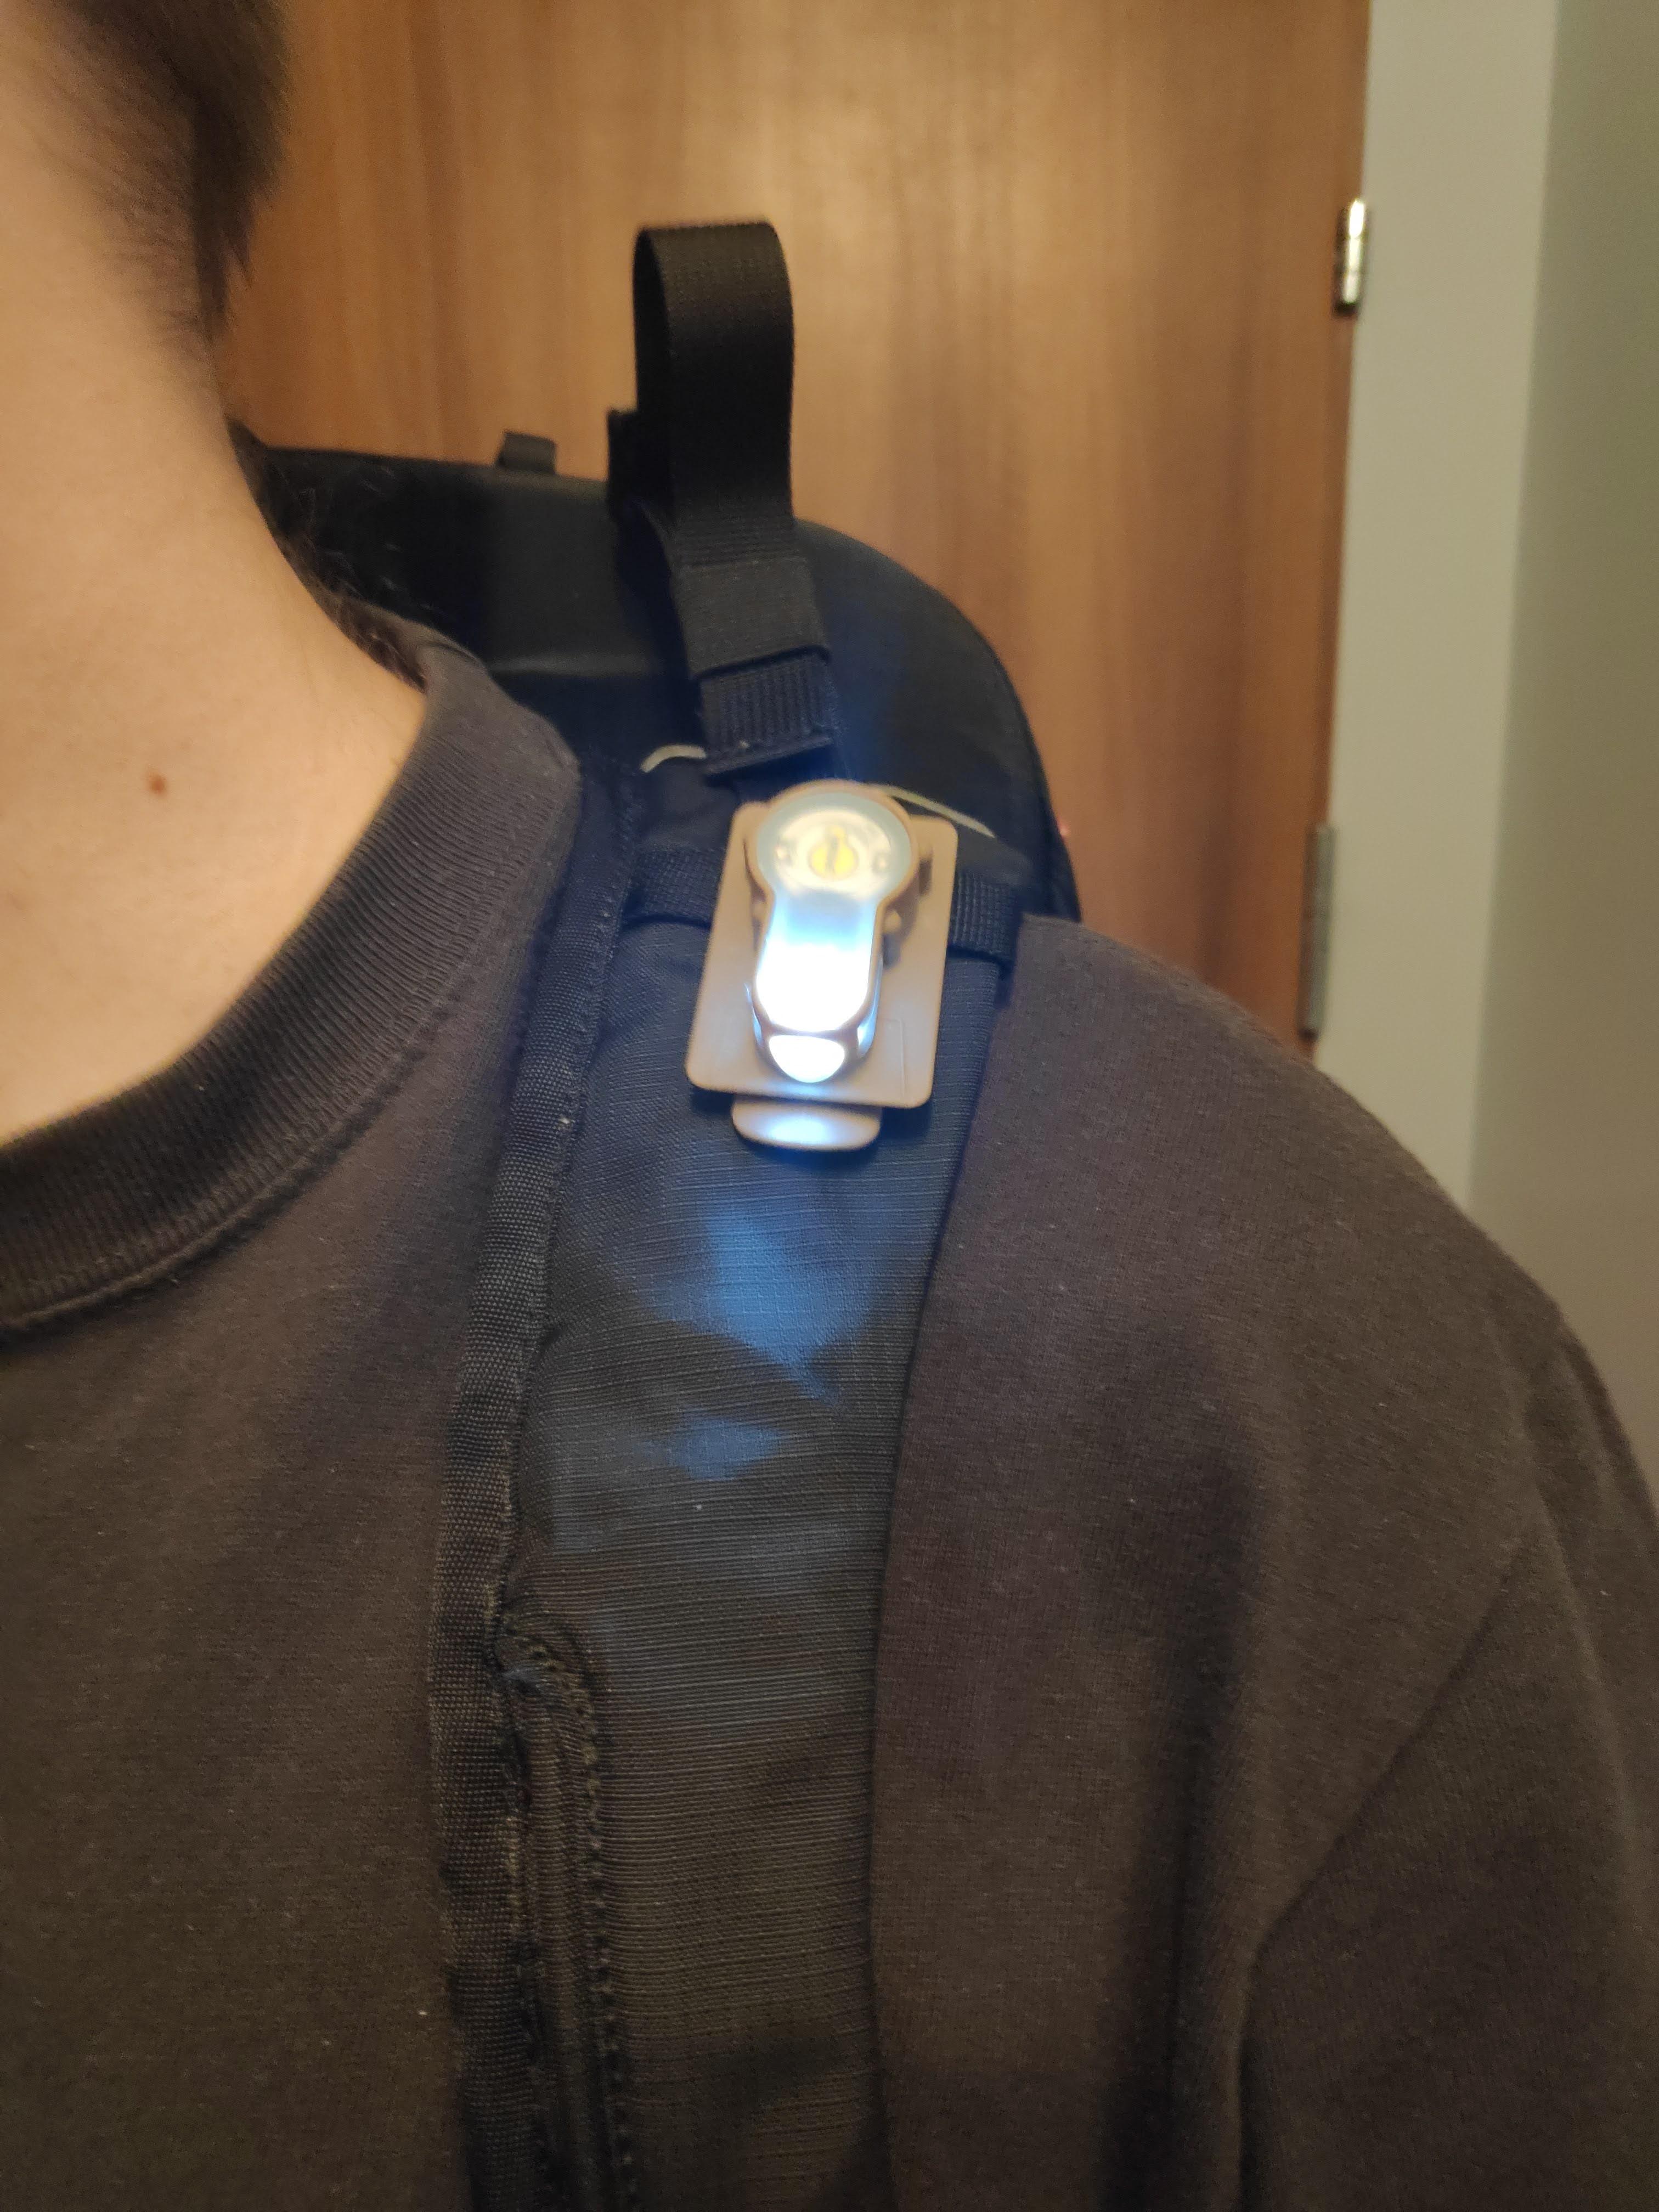 electronic marker on a waist bag